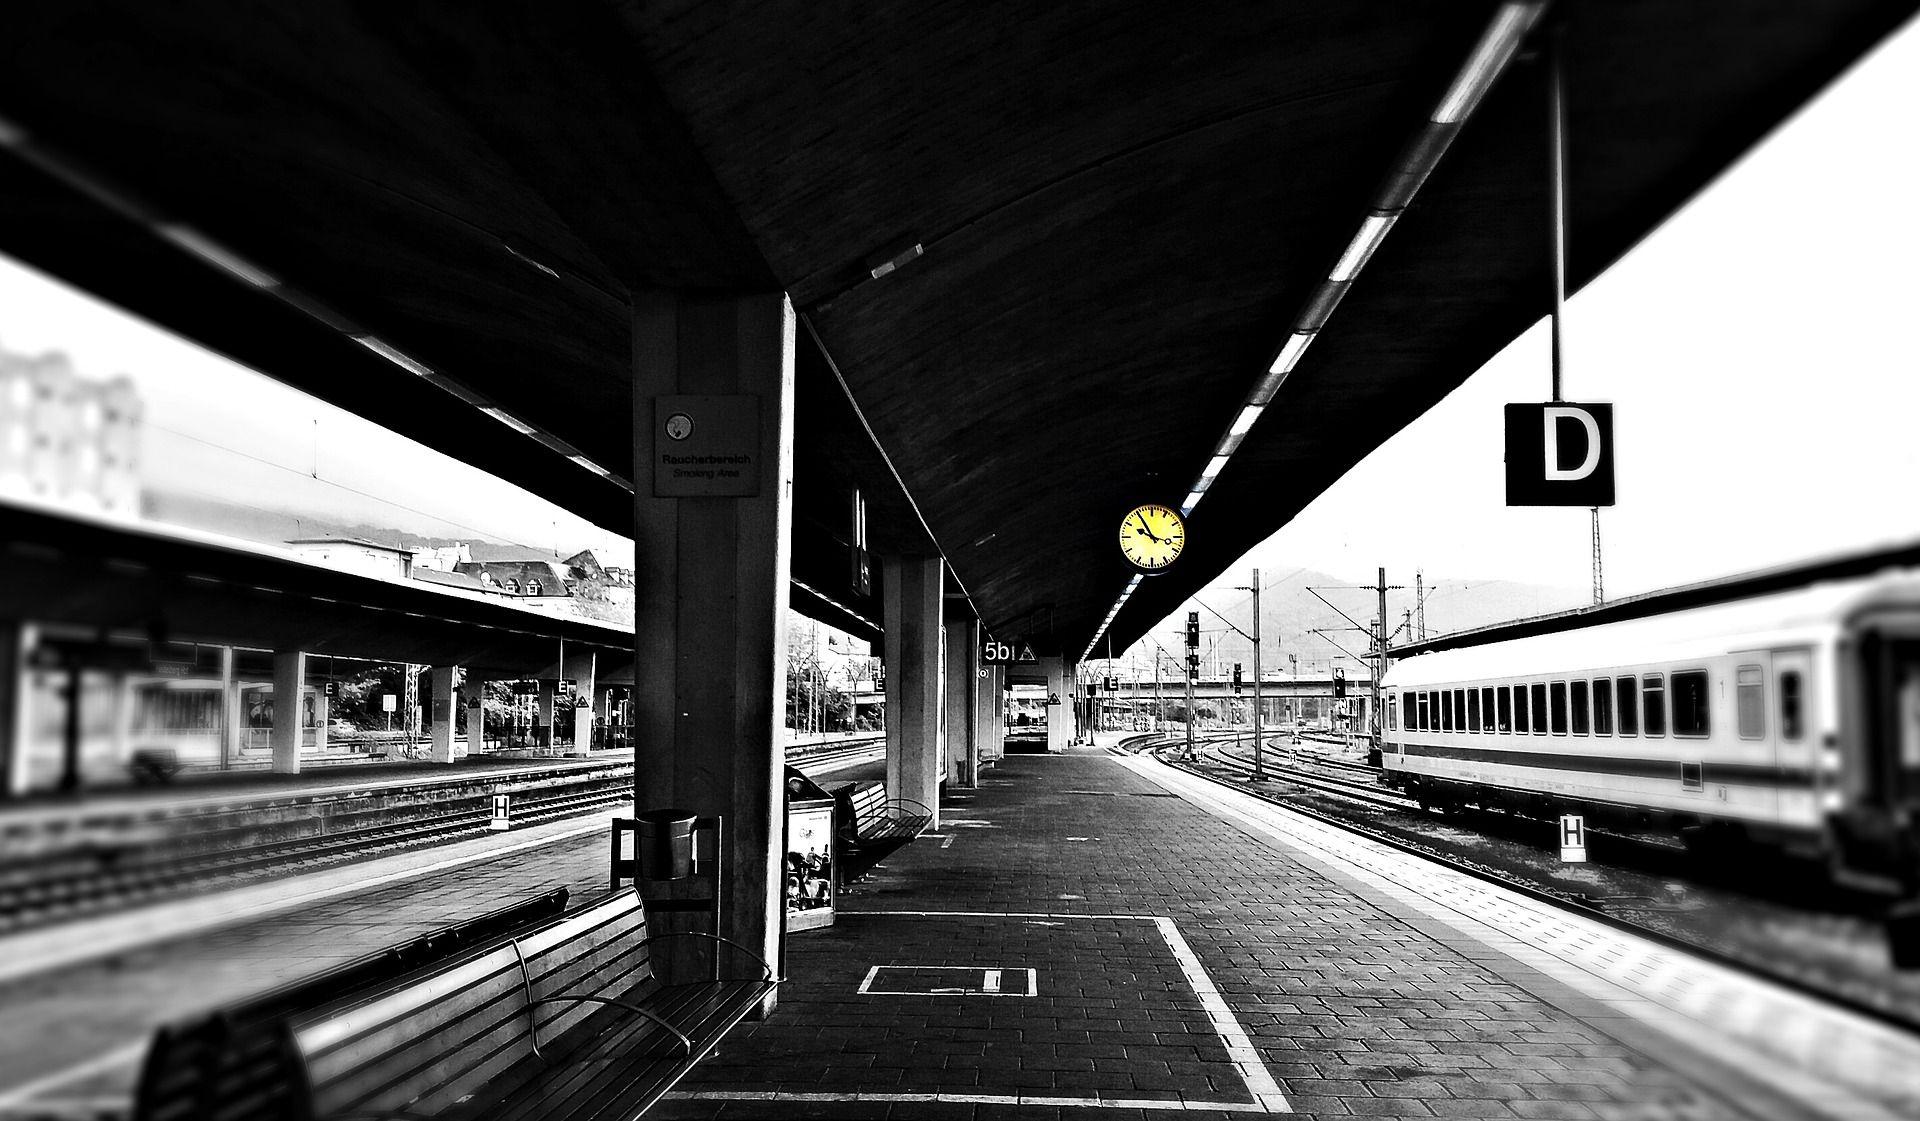 railway-station-2570325_1920